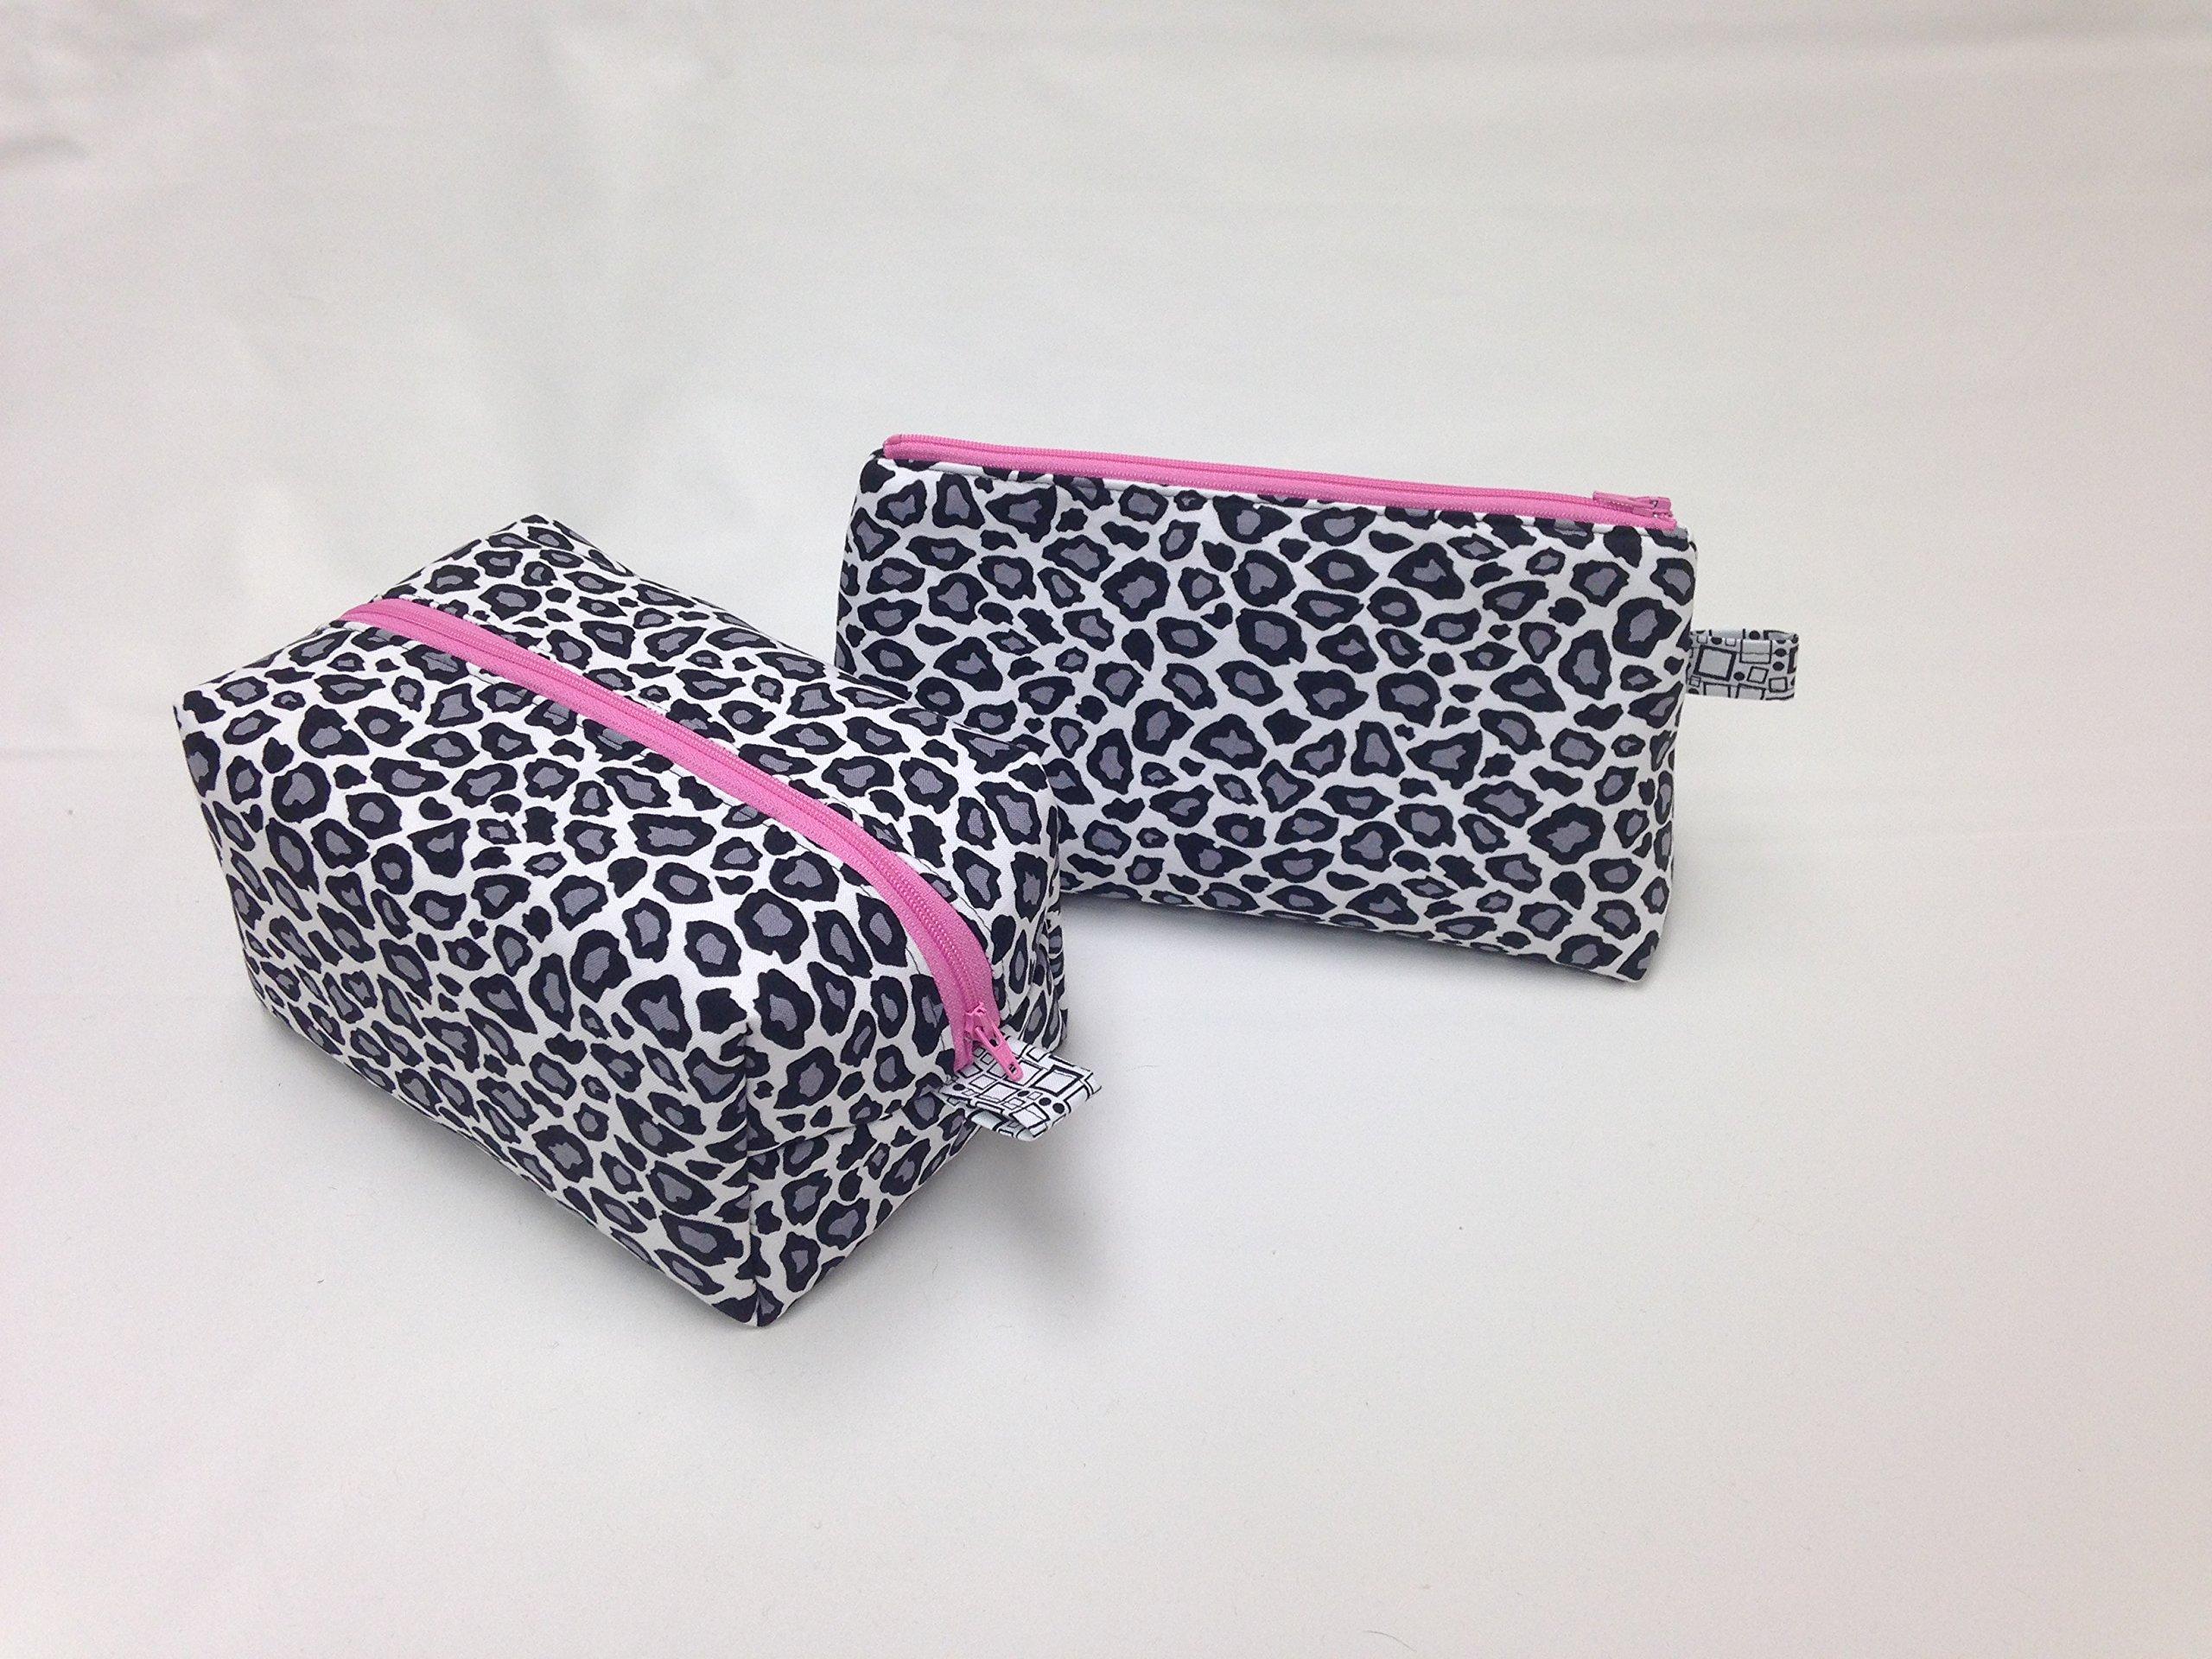 Modern Leopard II Toiletry/Makeup Bag Set